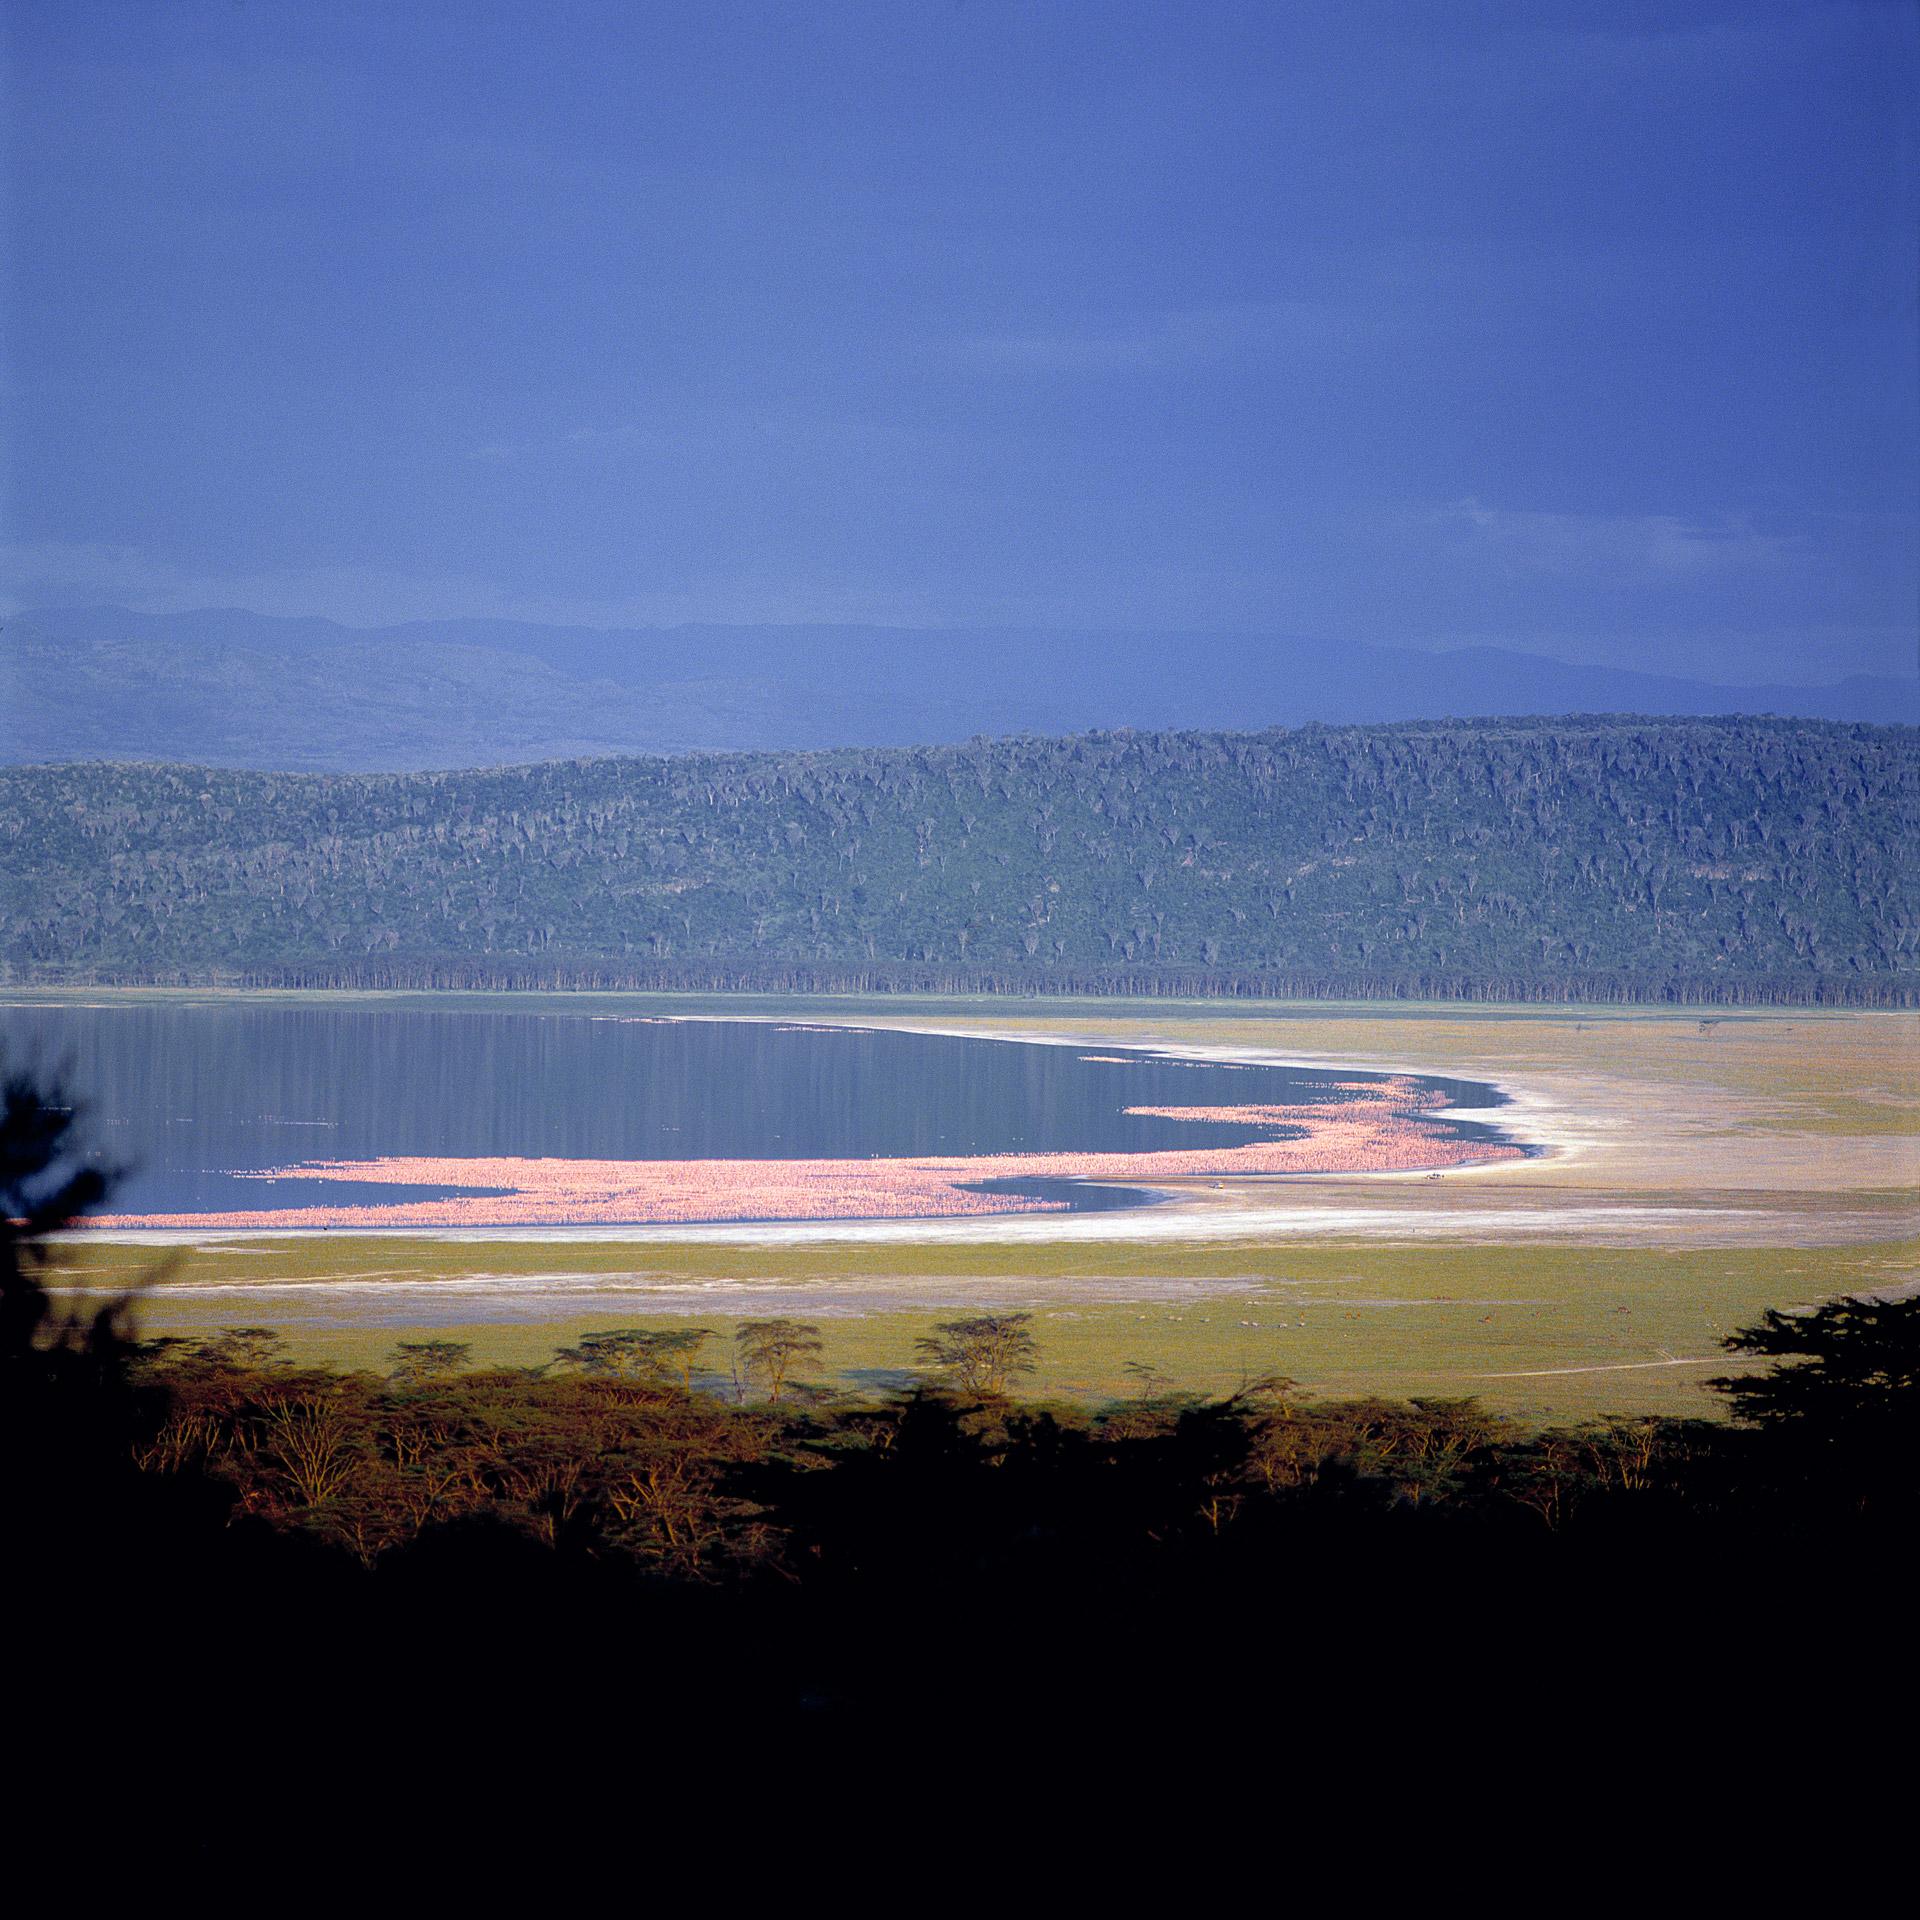 Lake Nakuru and thousands of pink Flamingos